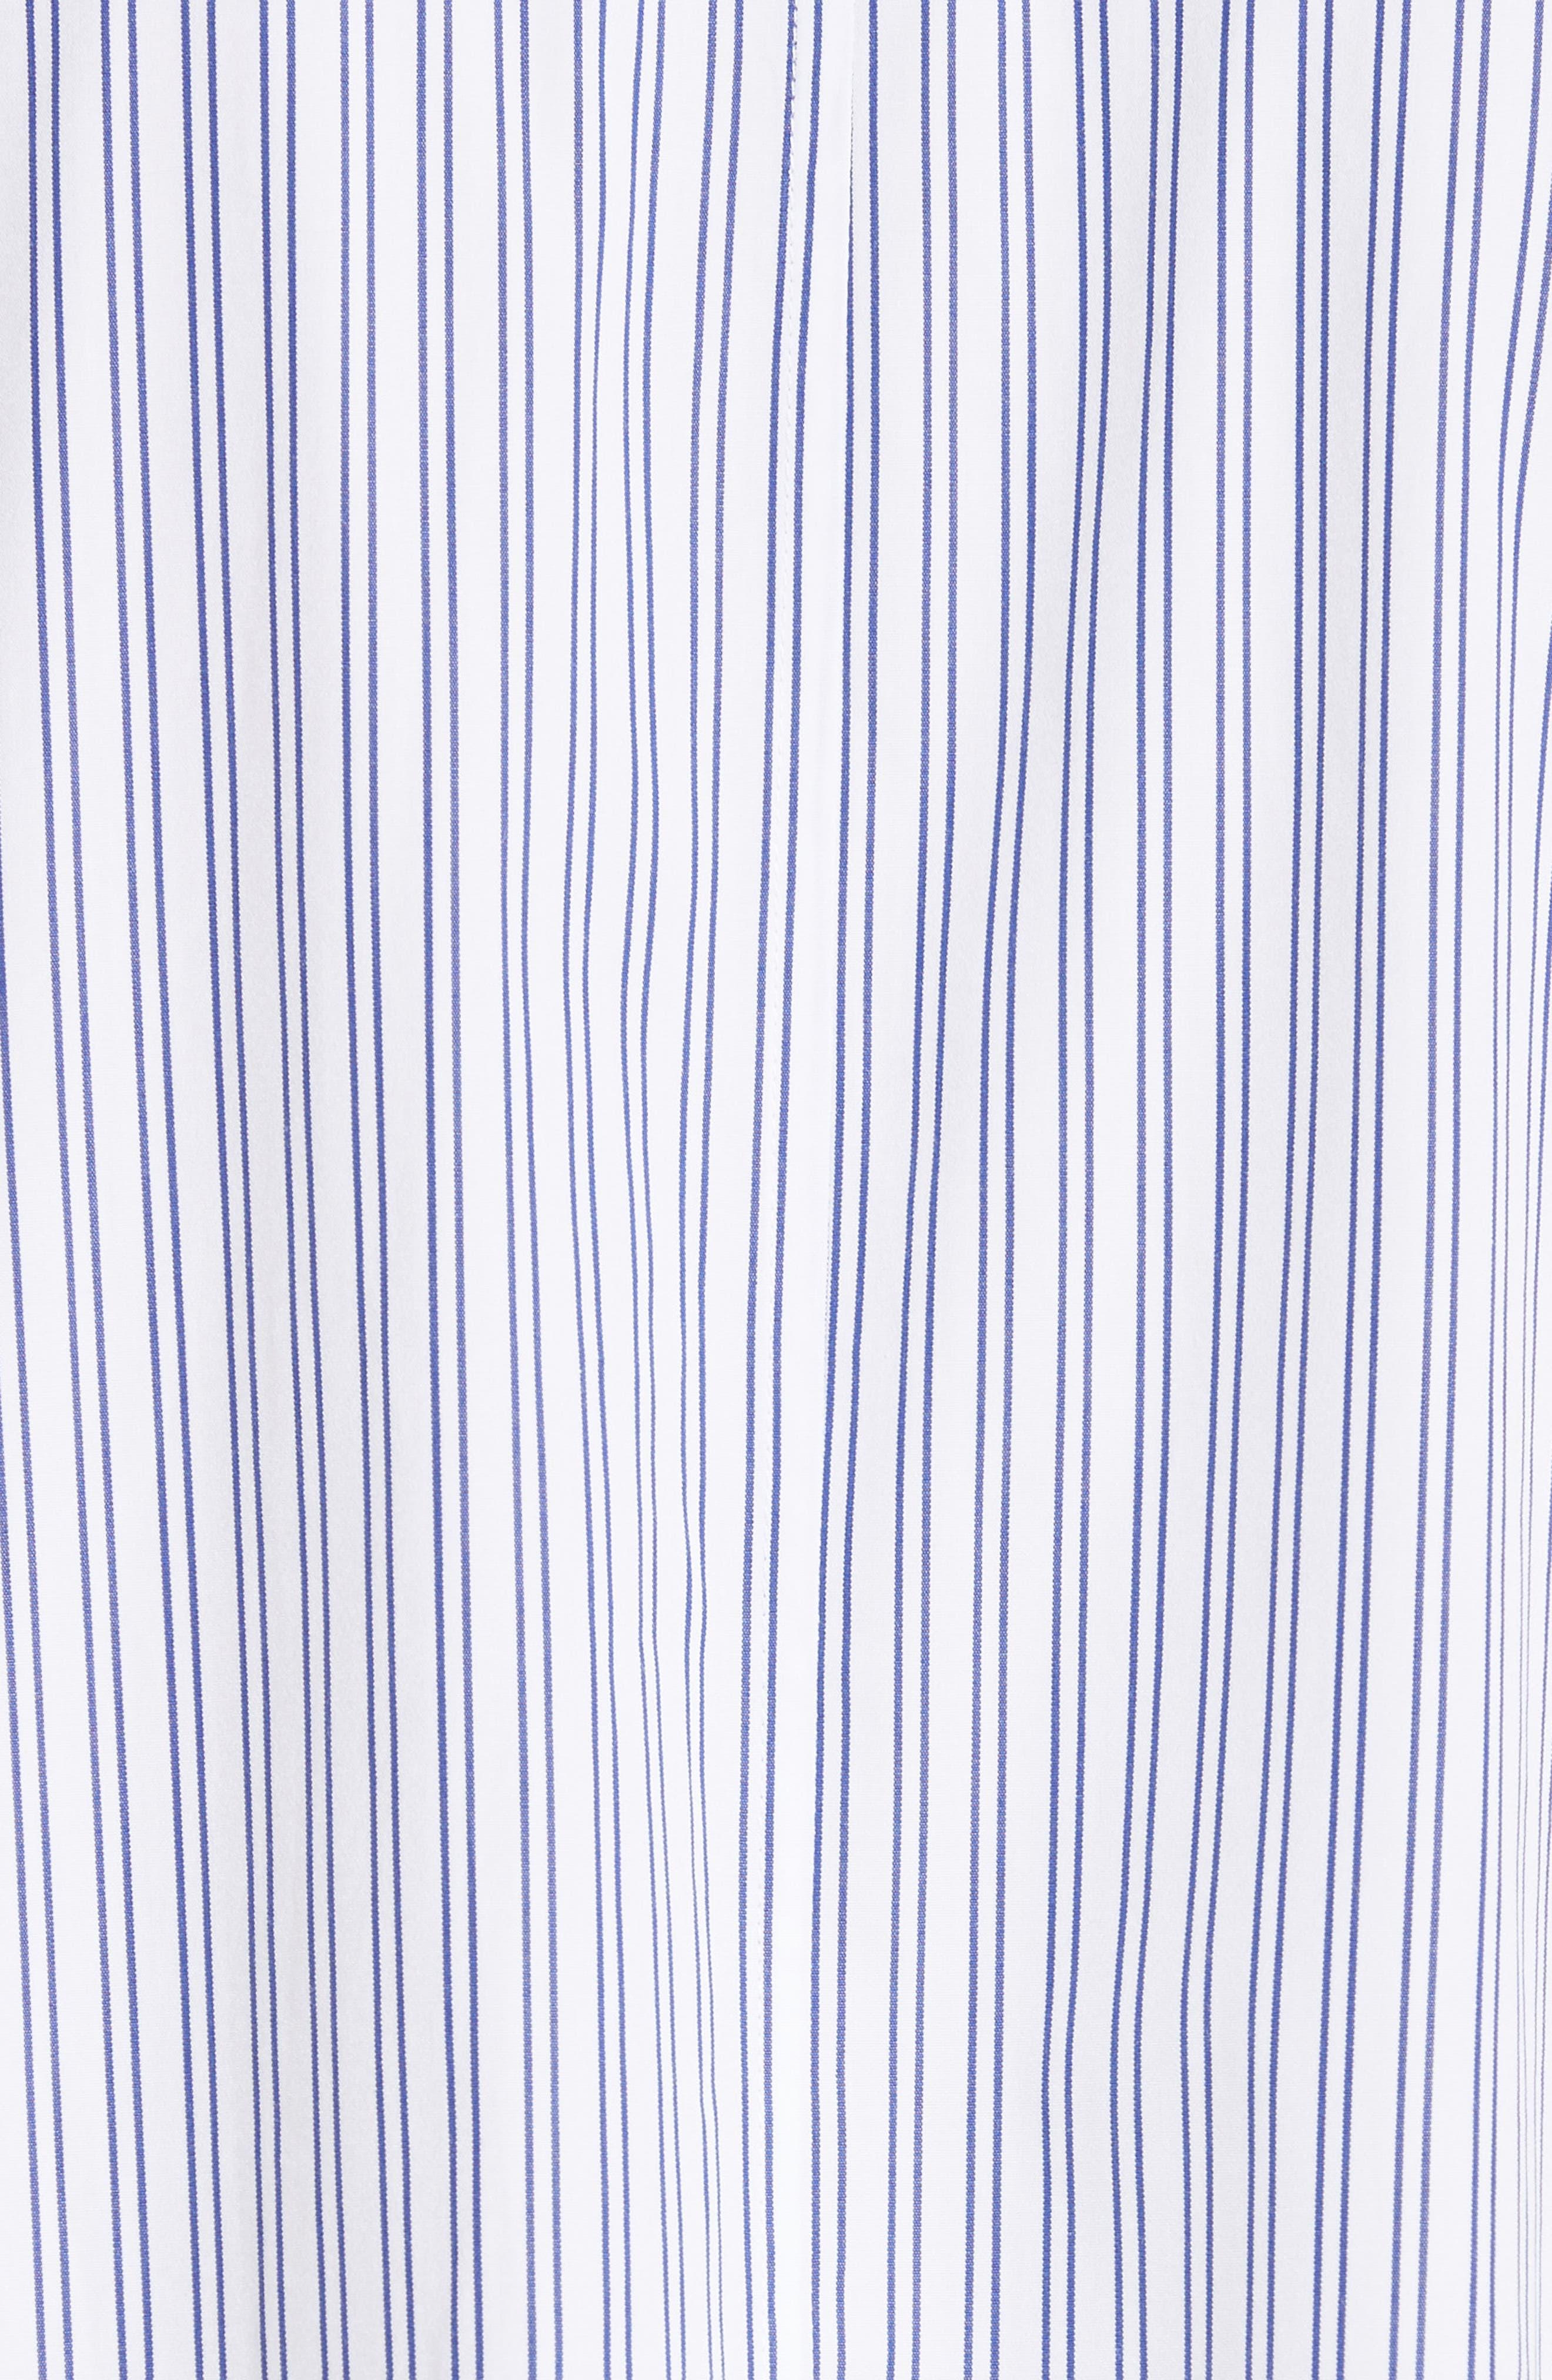 Victoria Oceanic Stripe Blouse,                             Alternate thumbnail 5, color,                             419